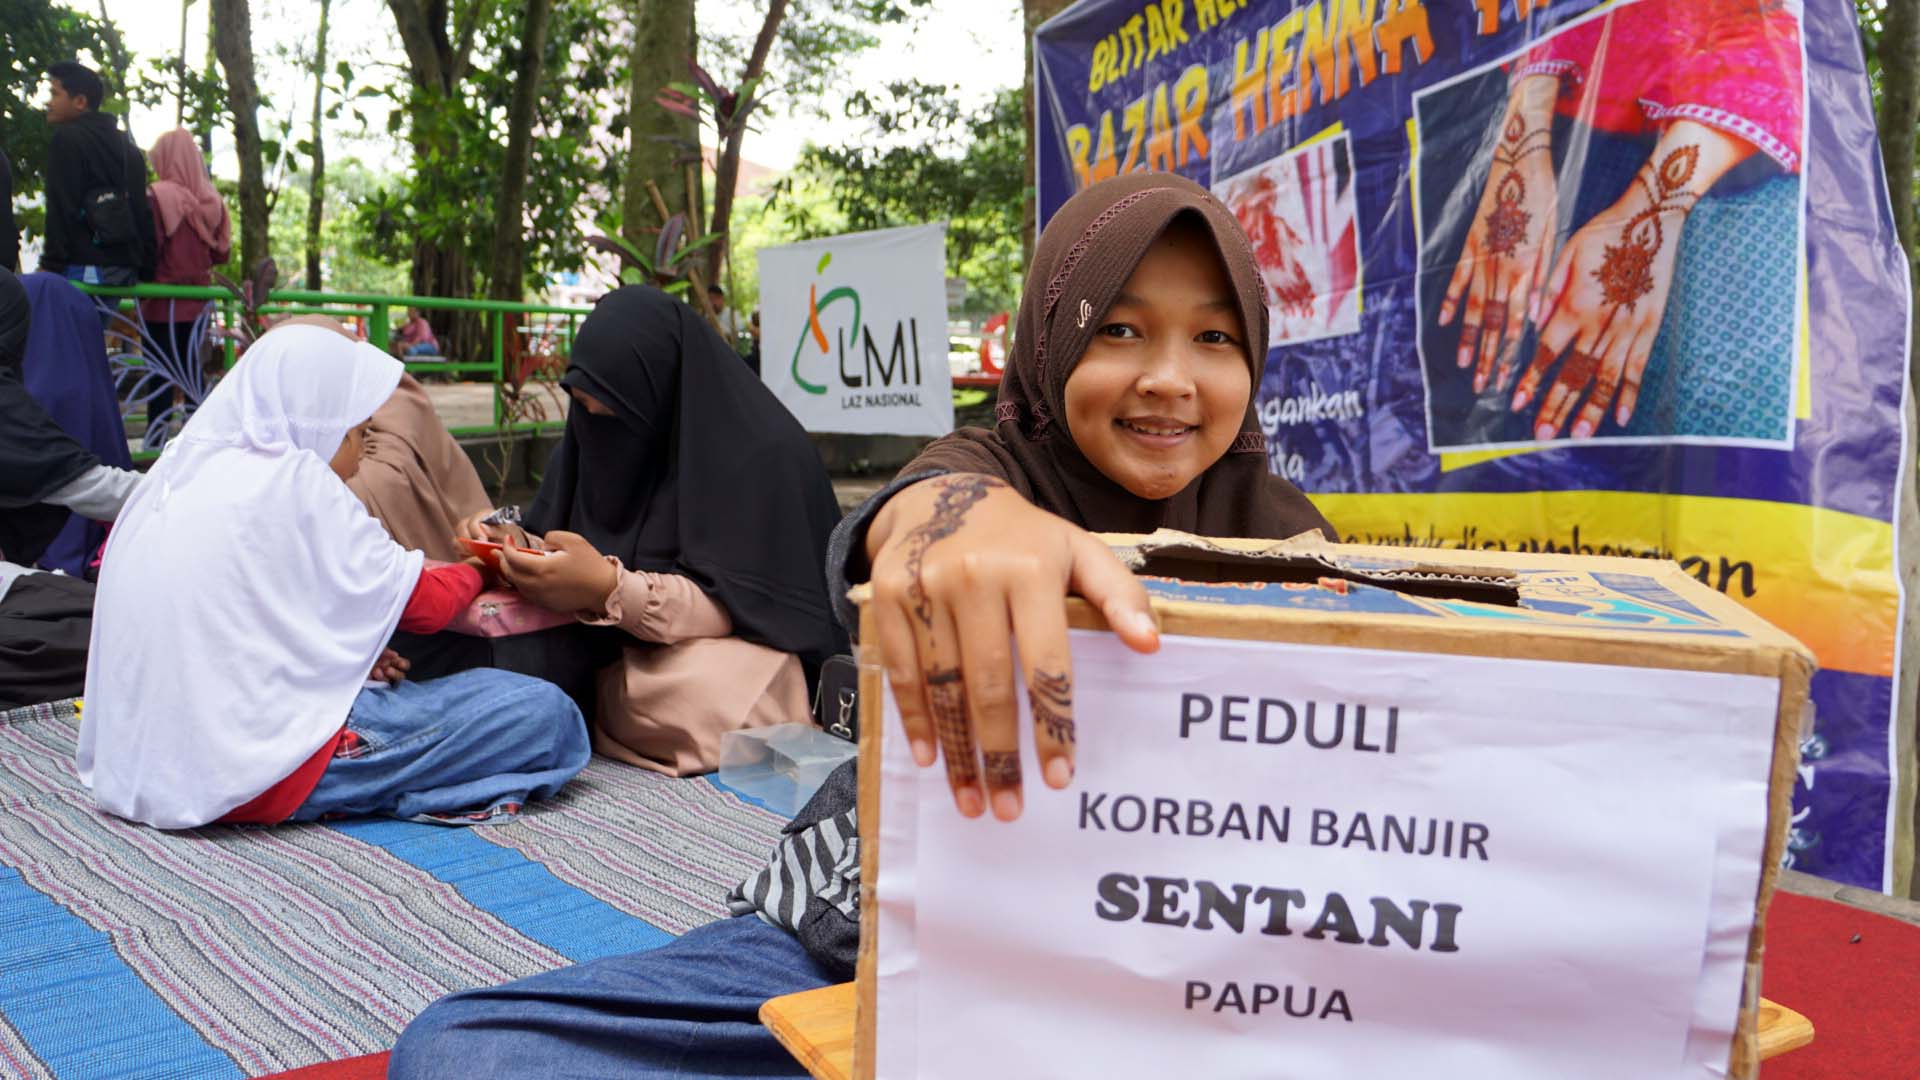 Komunitas Pelukis Henna Galang Dana Korban Banjir Sentani